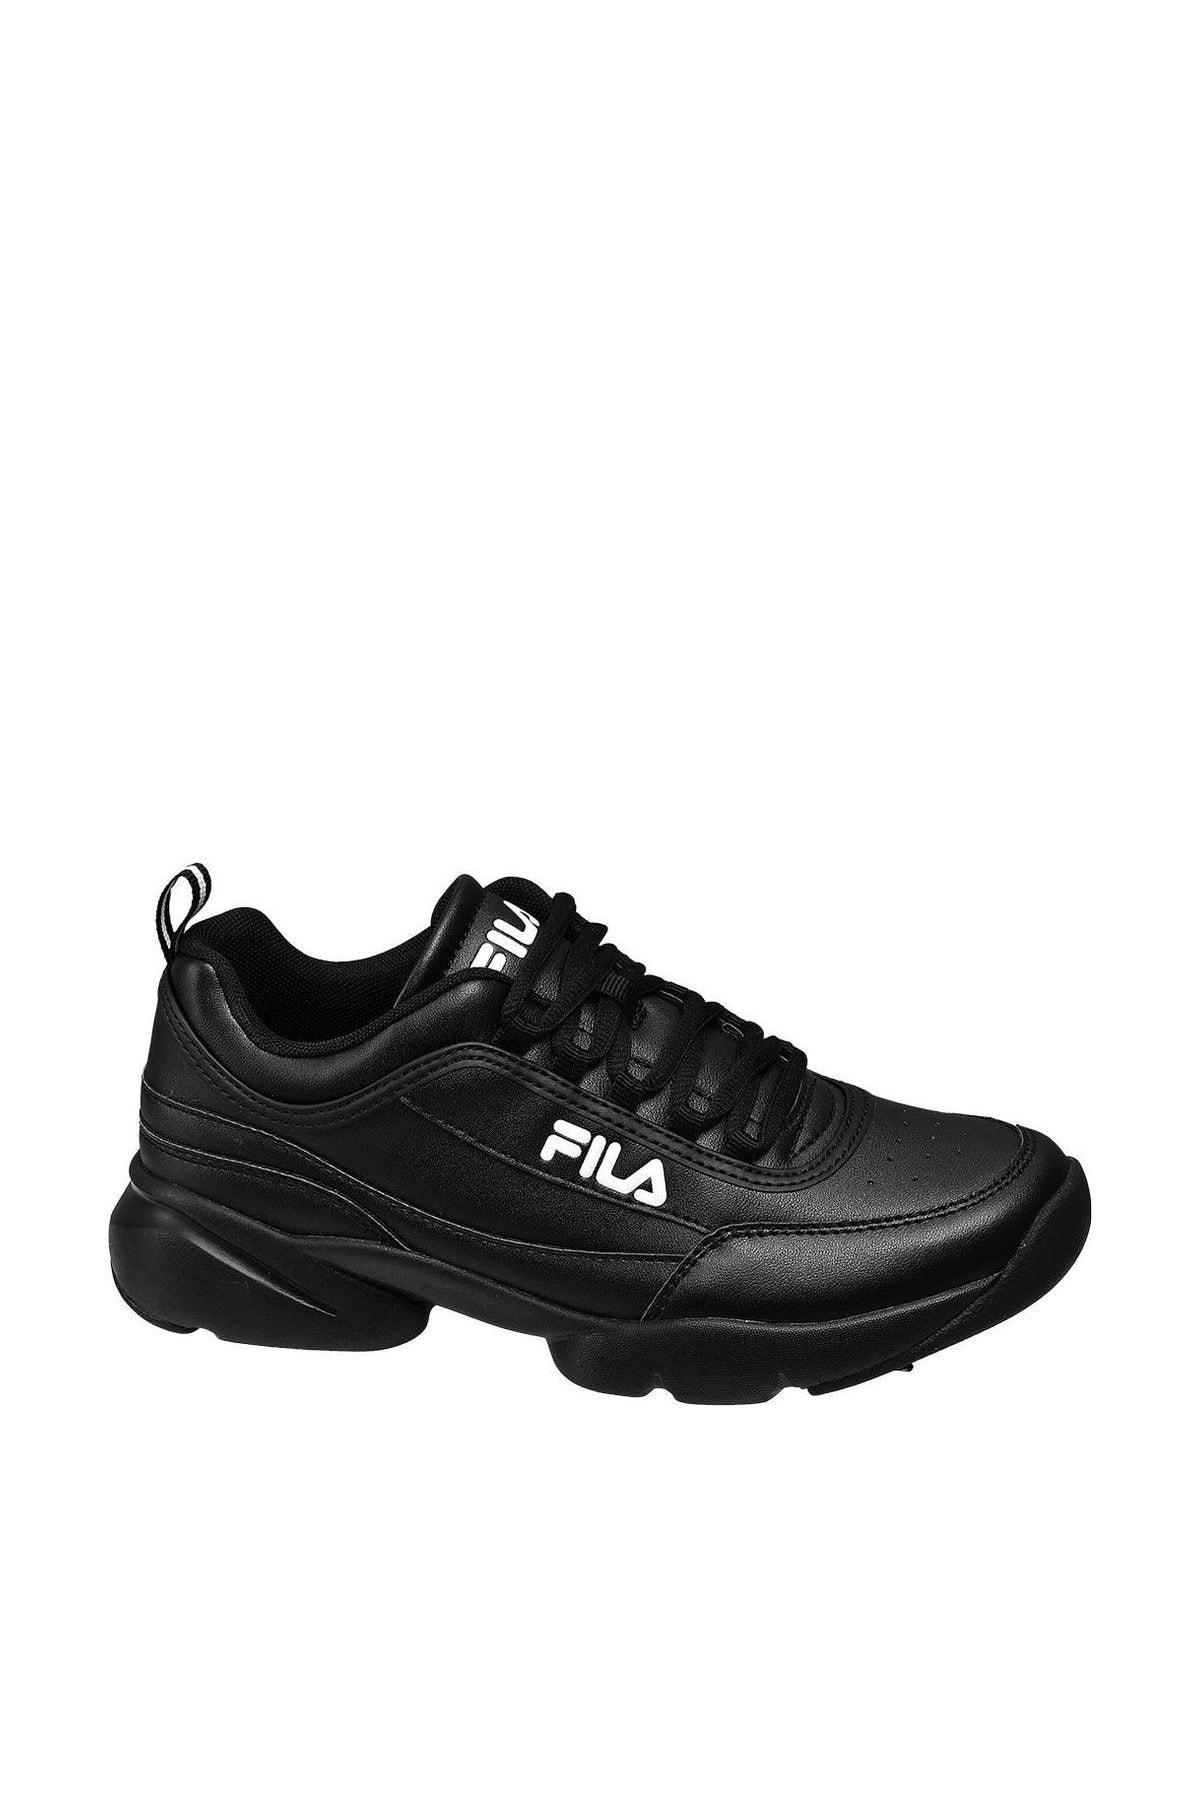 Fila Deichmann Kadın Sneaker - 1821808 1